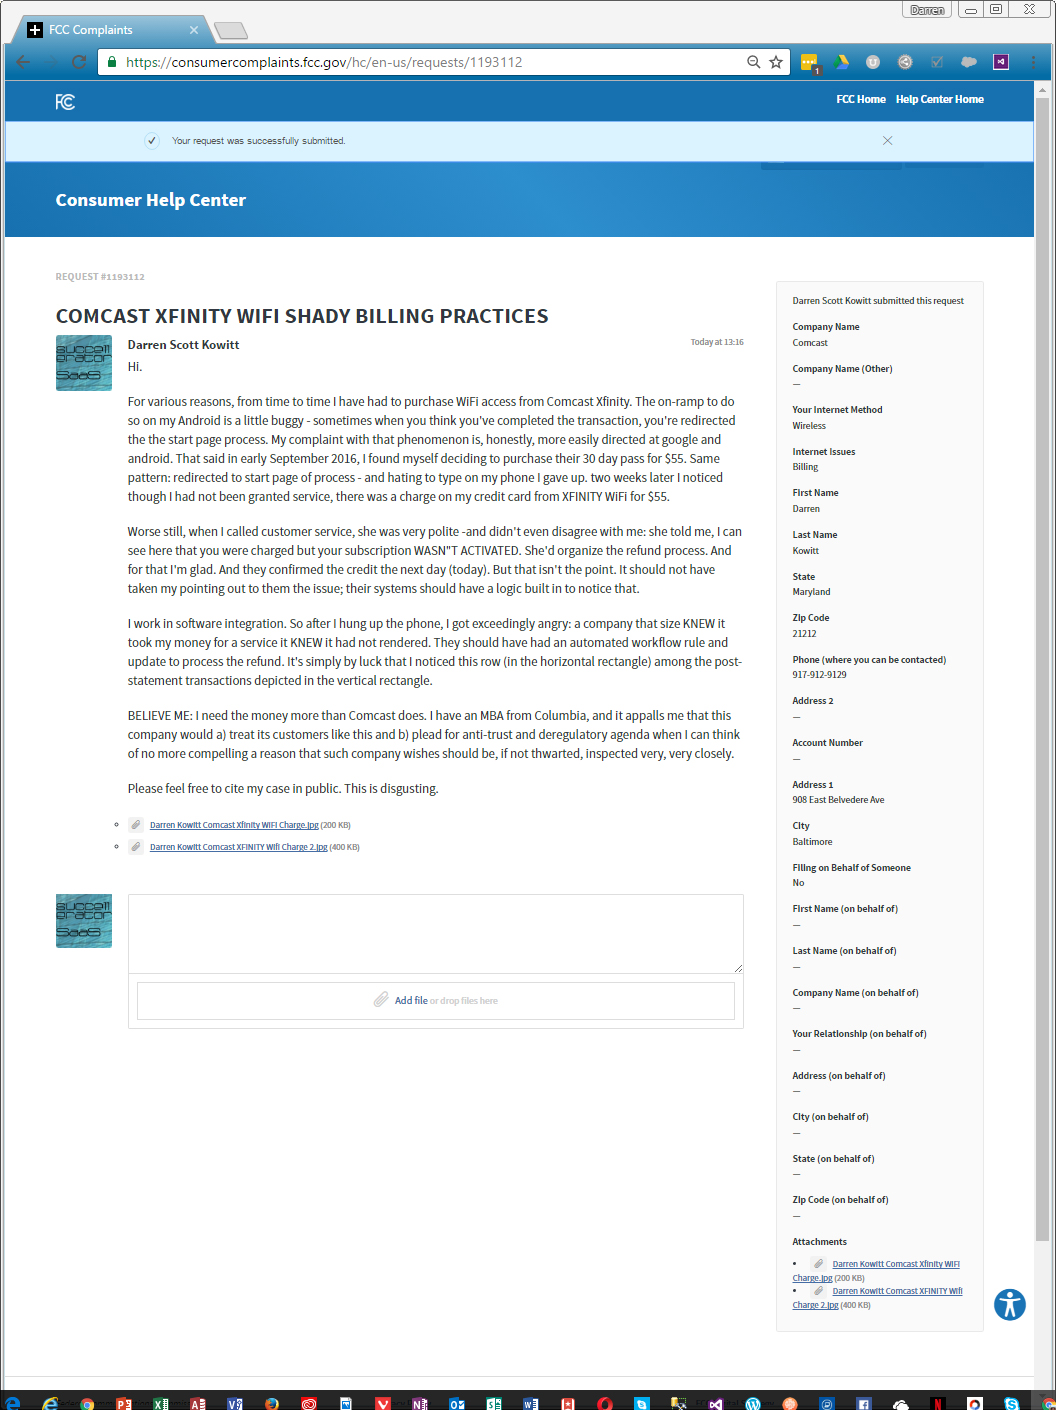 Comcast XFINITY Wifi Pass: Shady Billing Practices